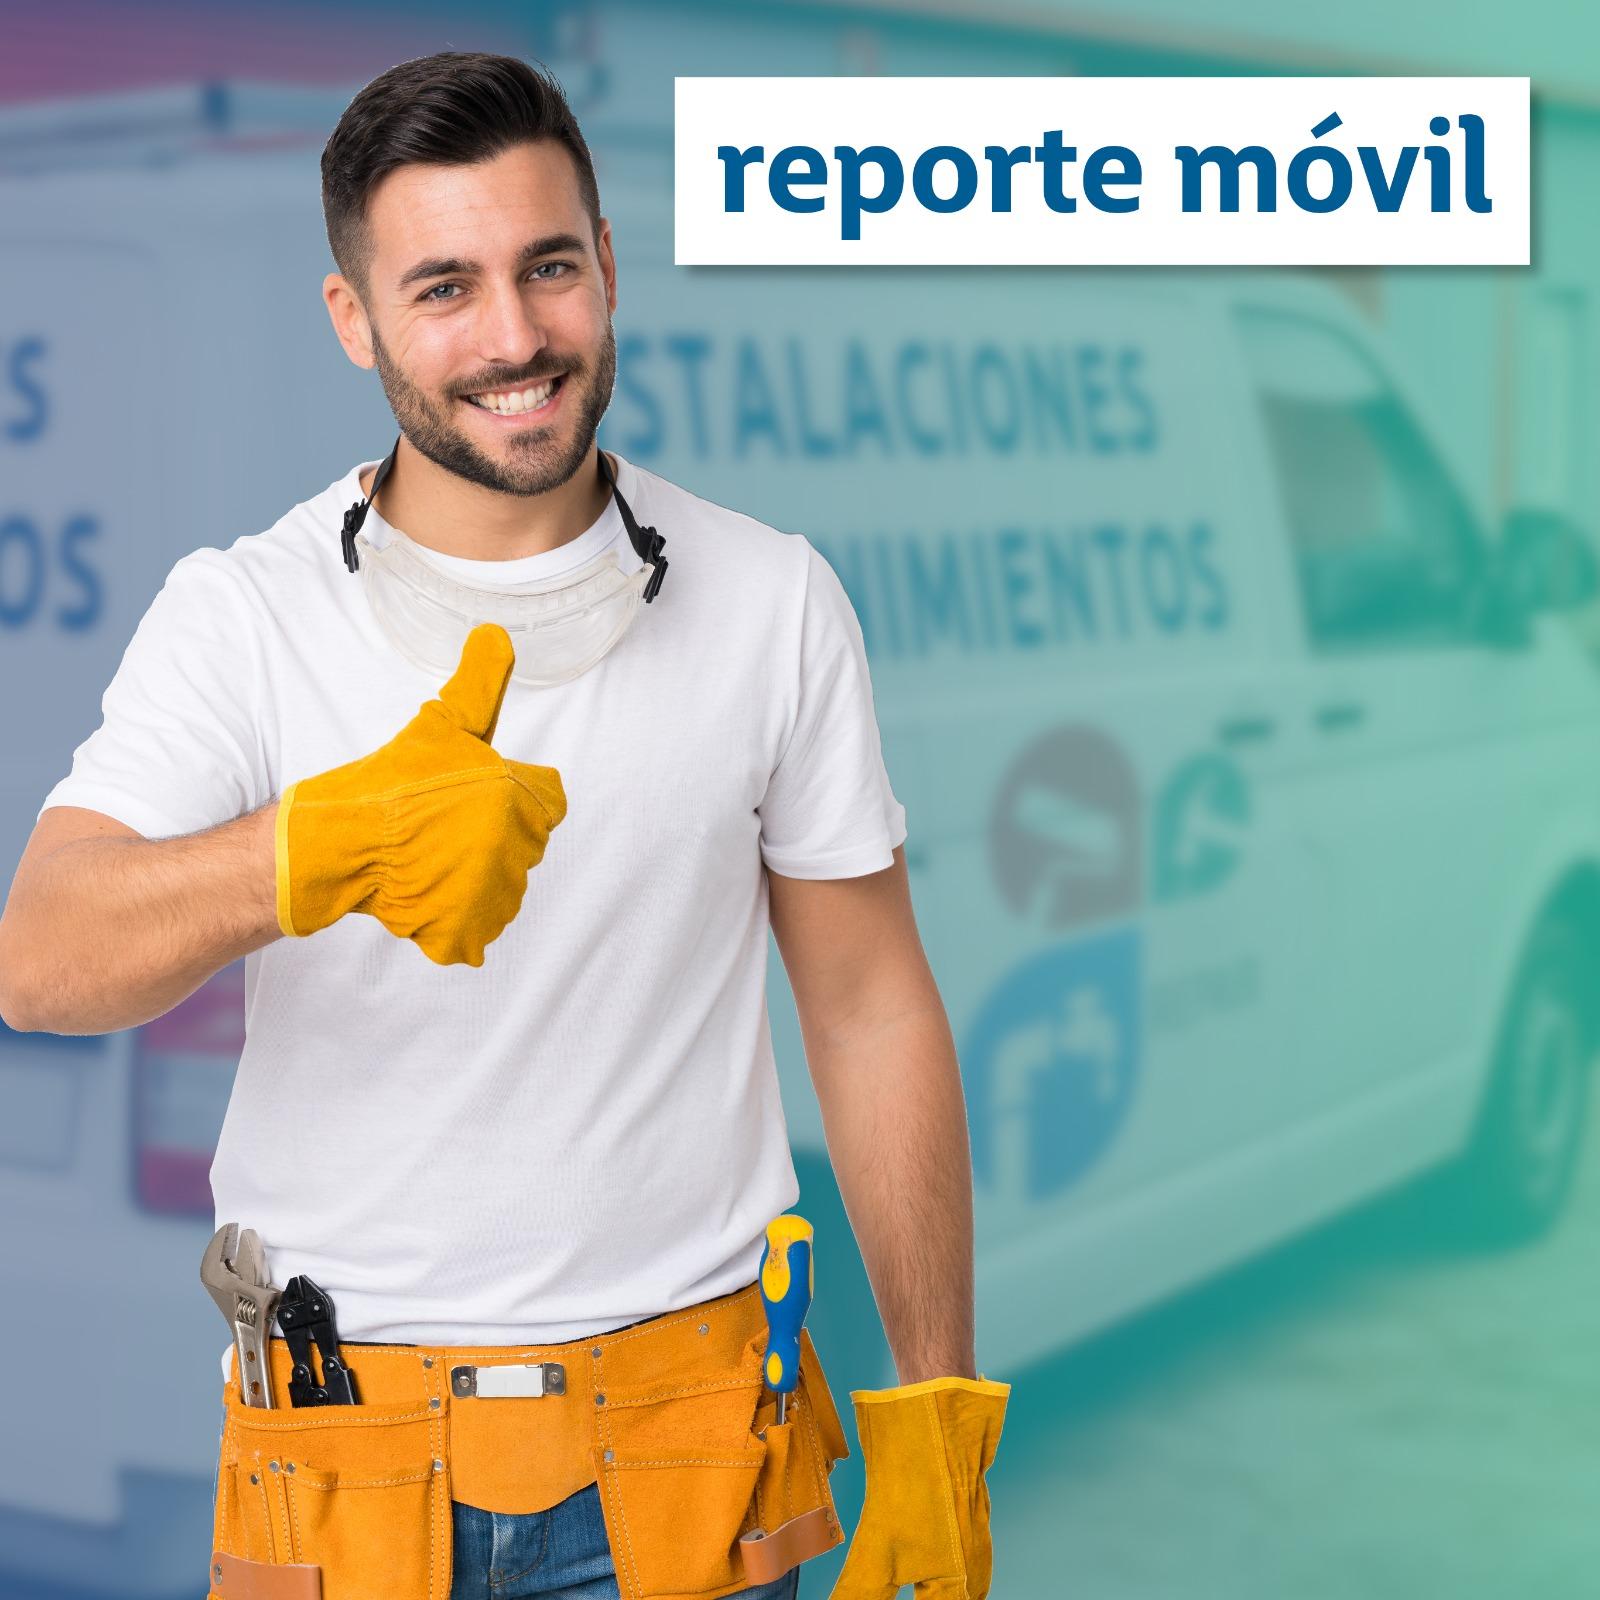 app reporte movil